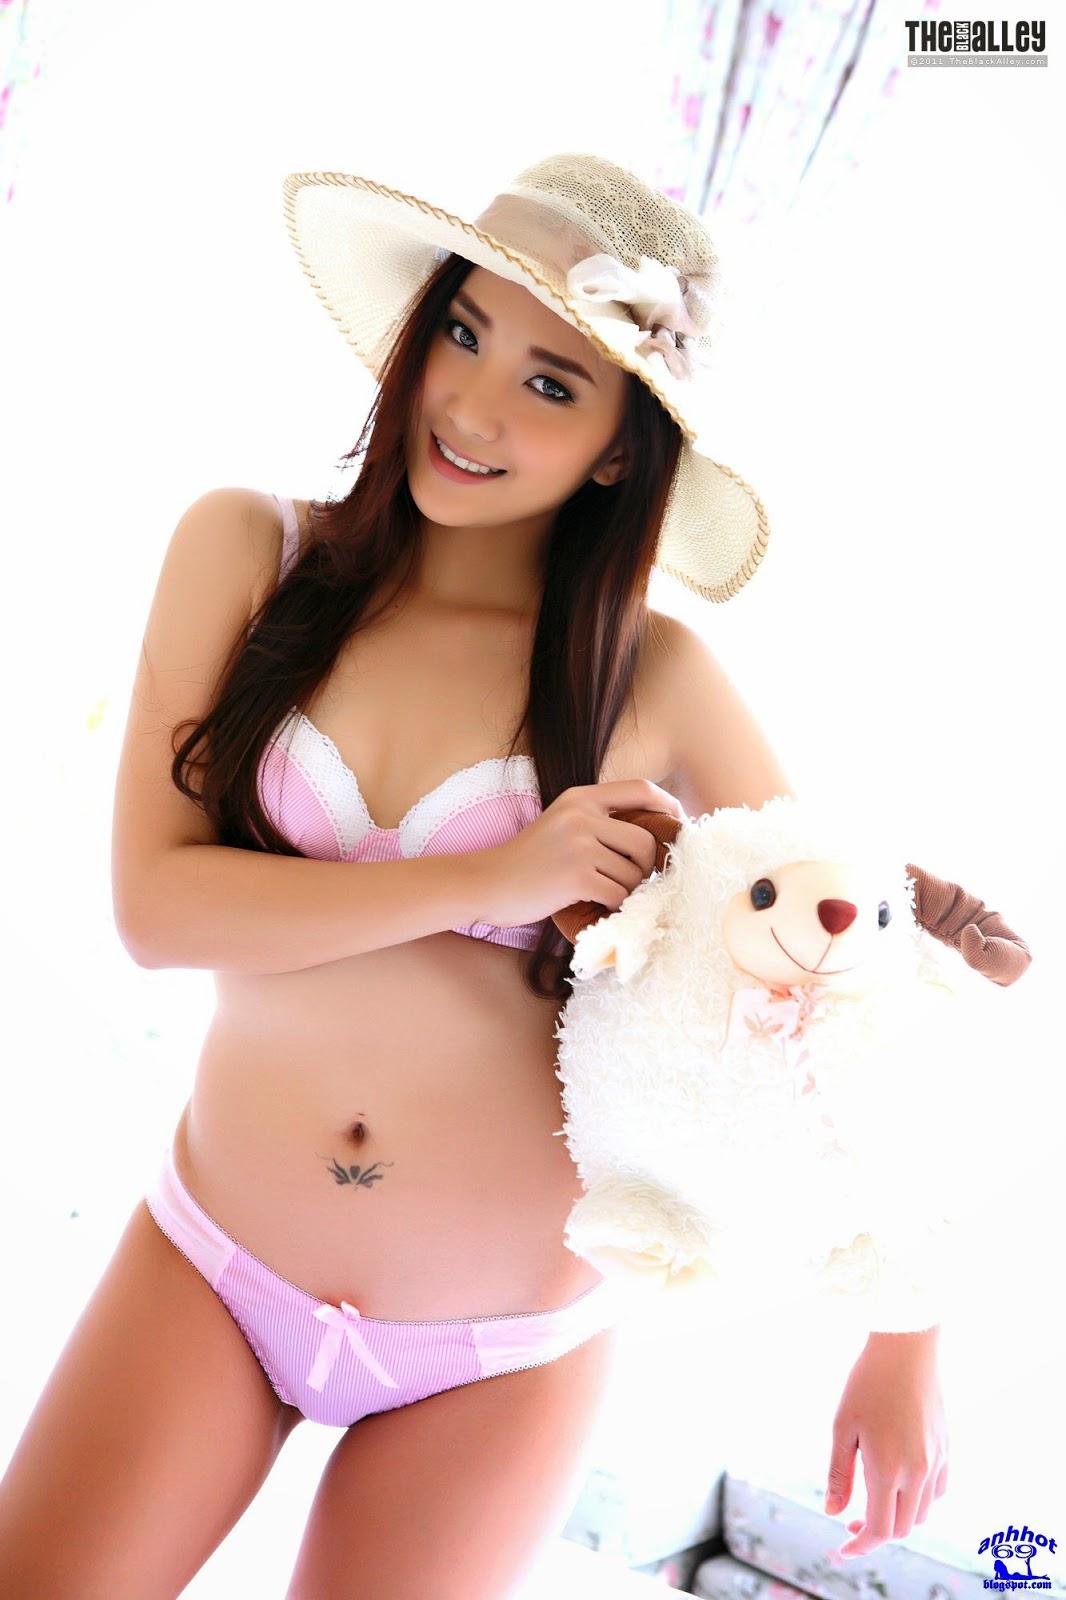 lolita-cheng-64-013